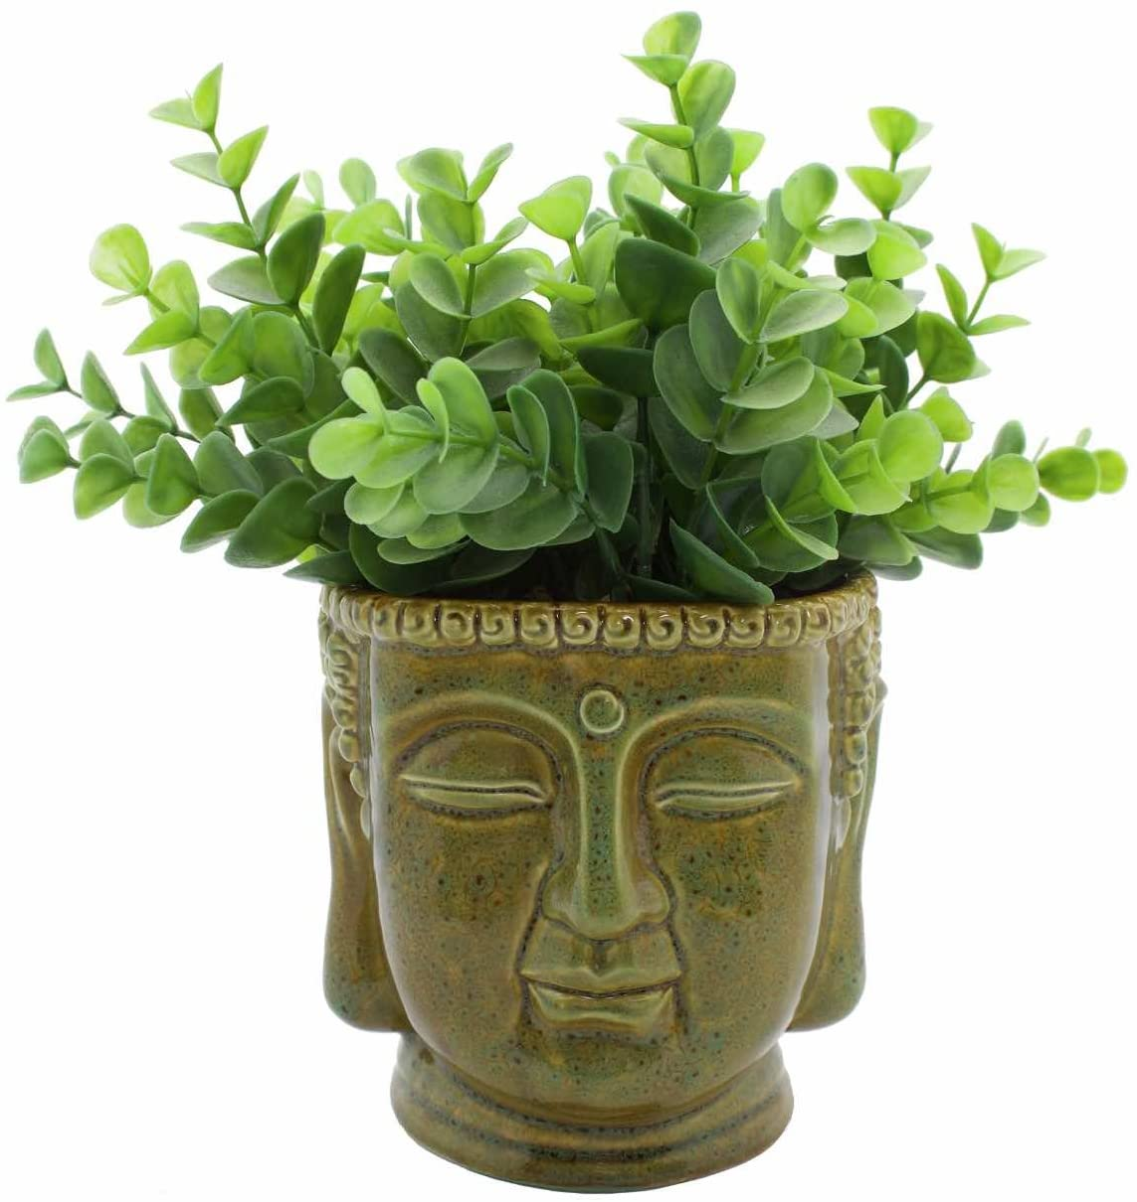 Streamline Buddha Head Ceramic Planter Pot/Colors May Vary